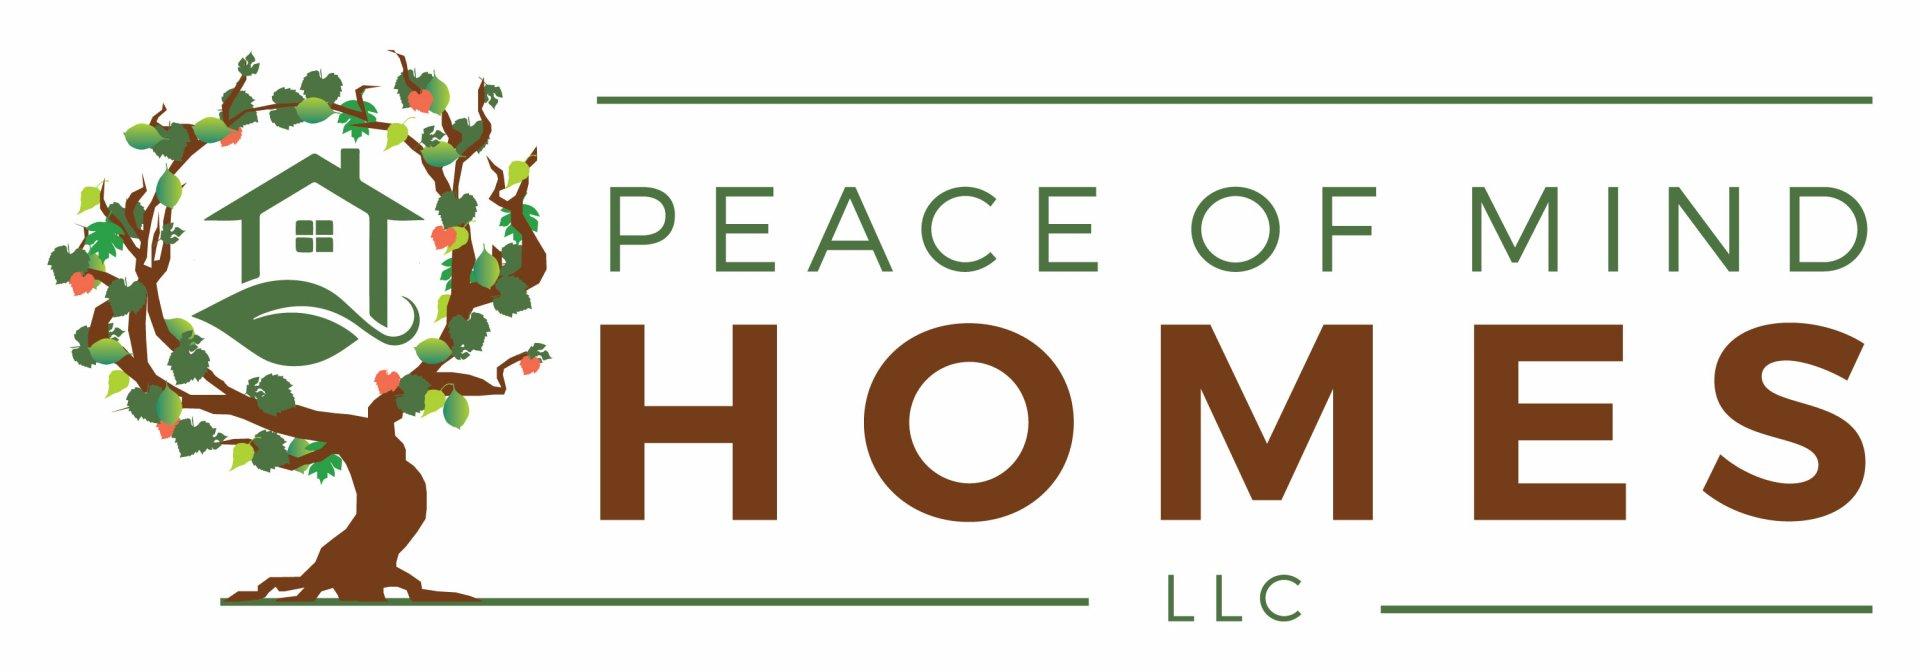 PEACE OF MIND HOMES, LLC logo